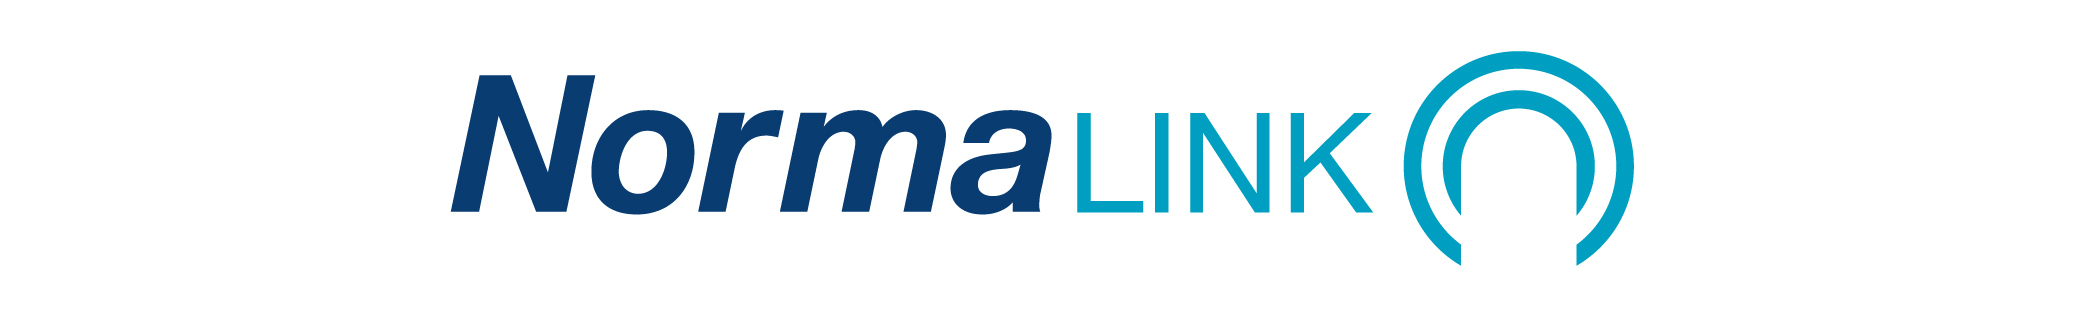 Logo NORMALINK